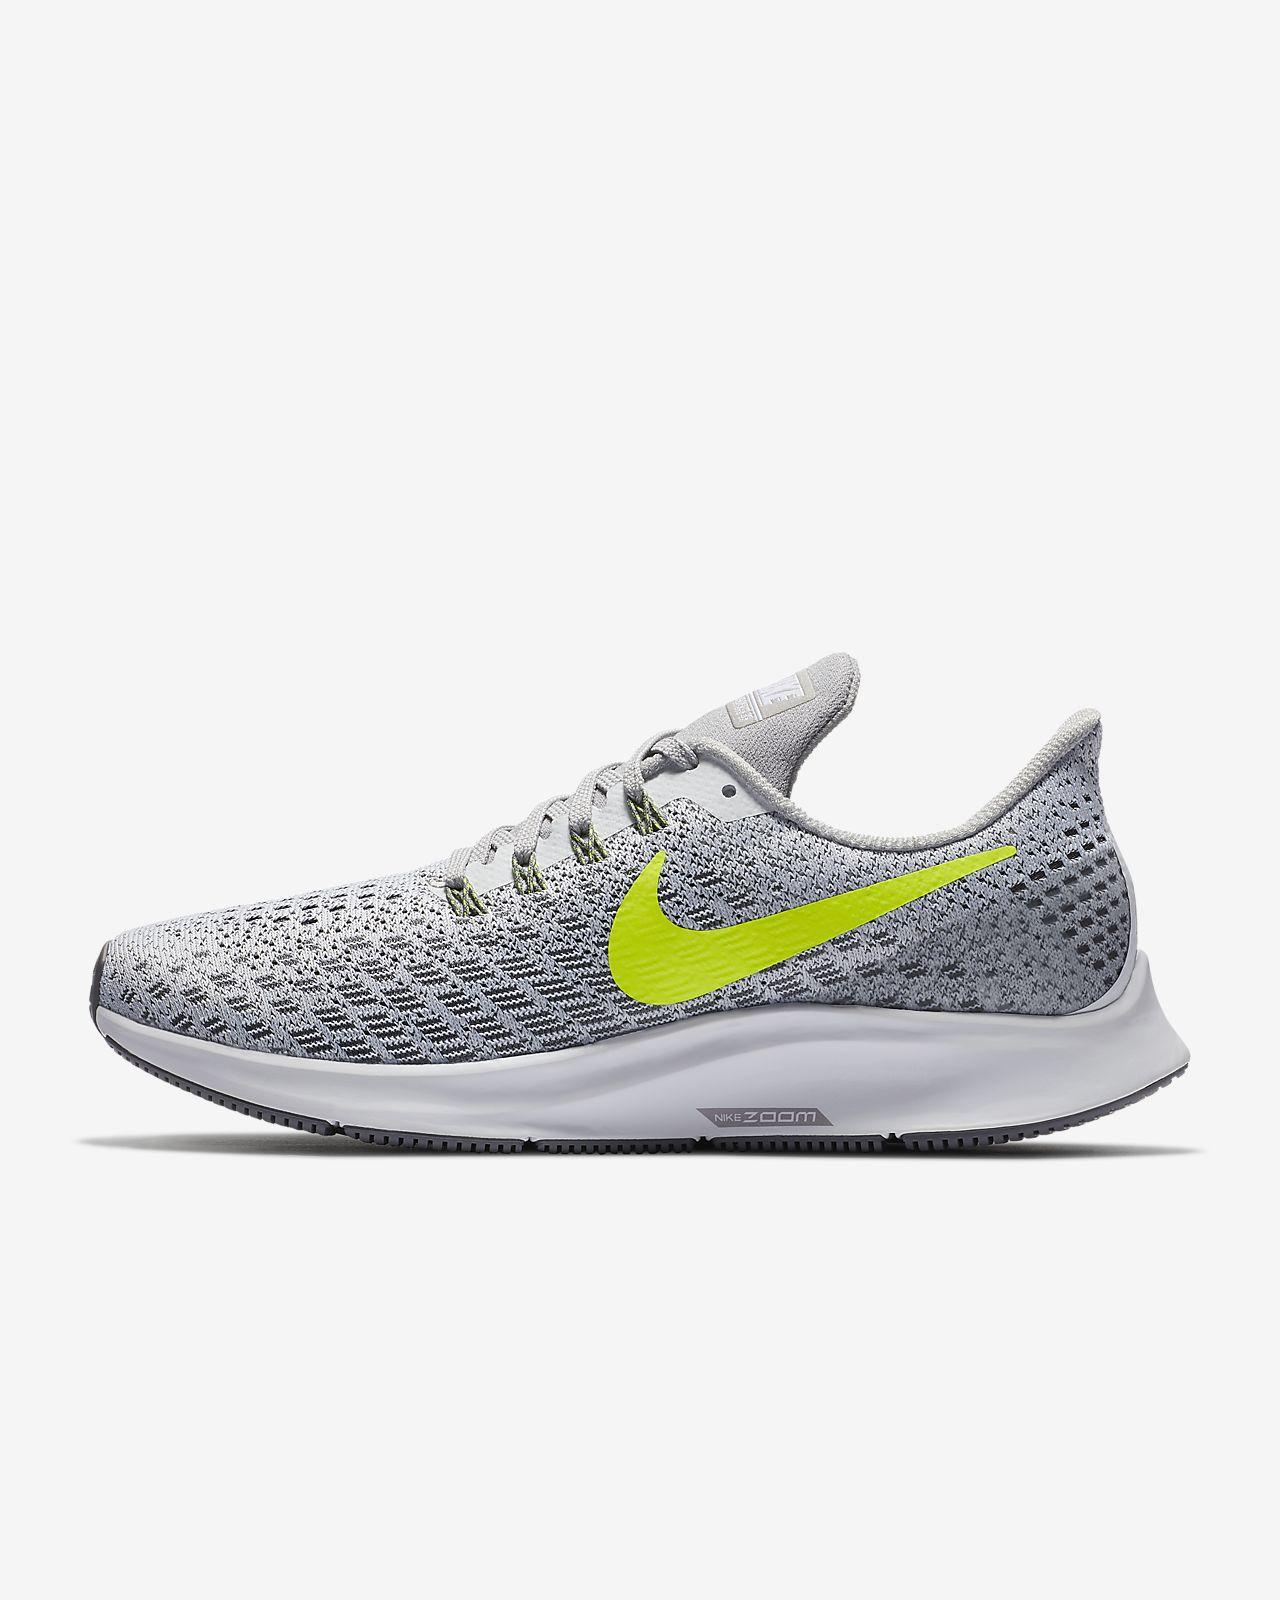 wholesale dealer c9851 90260 ... Nike Air Zoom Pegasus 35-løbesko til kvinder